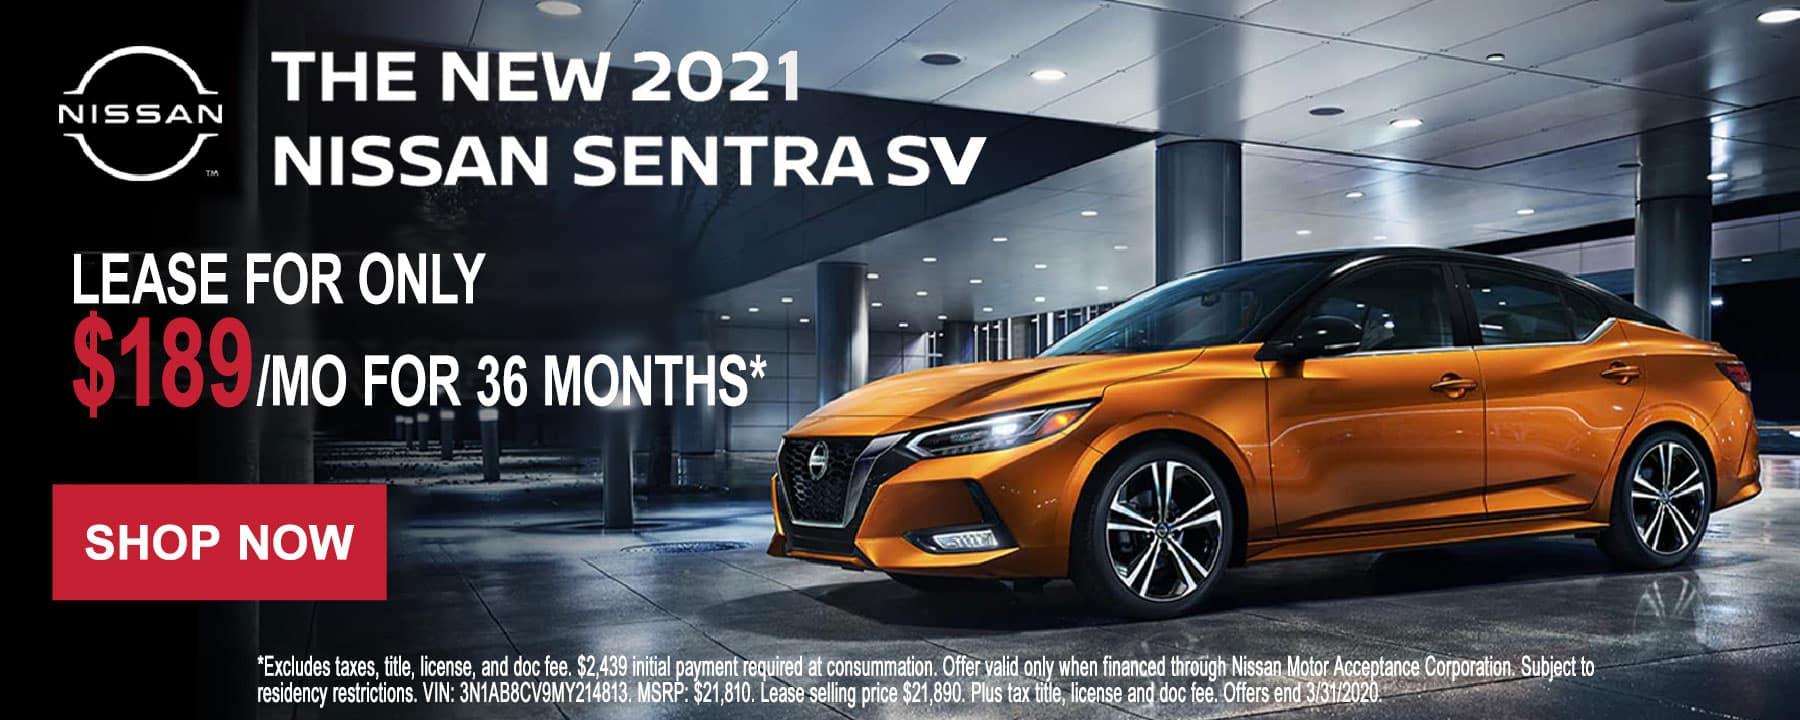 Sentra lease offer